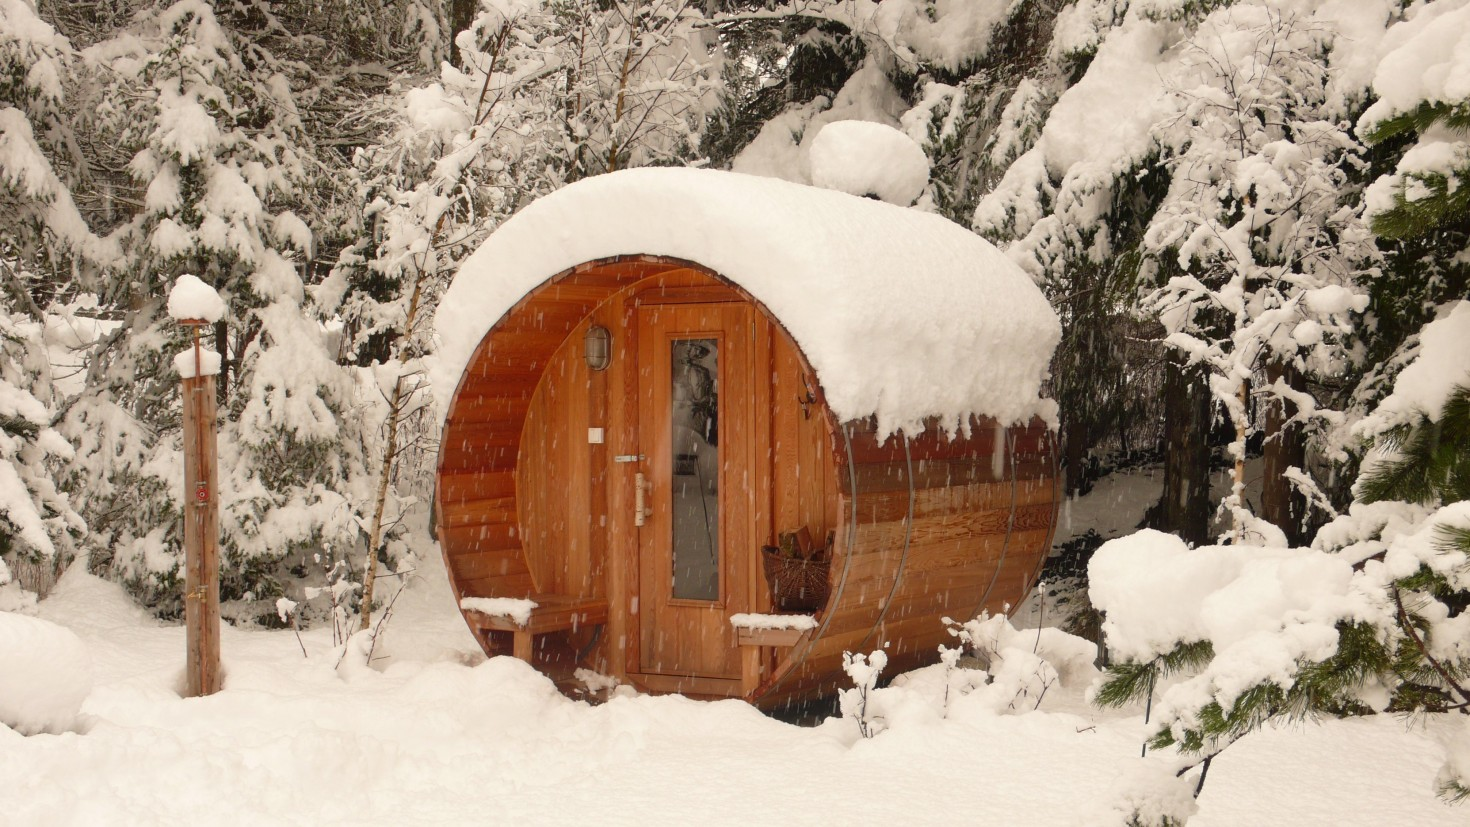 chamonix chalet and garden photos in winter